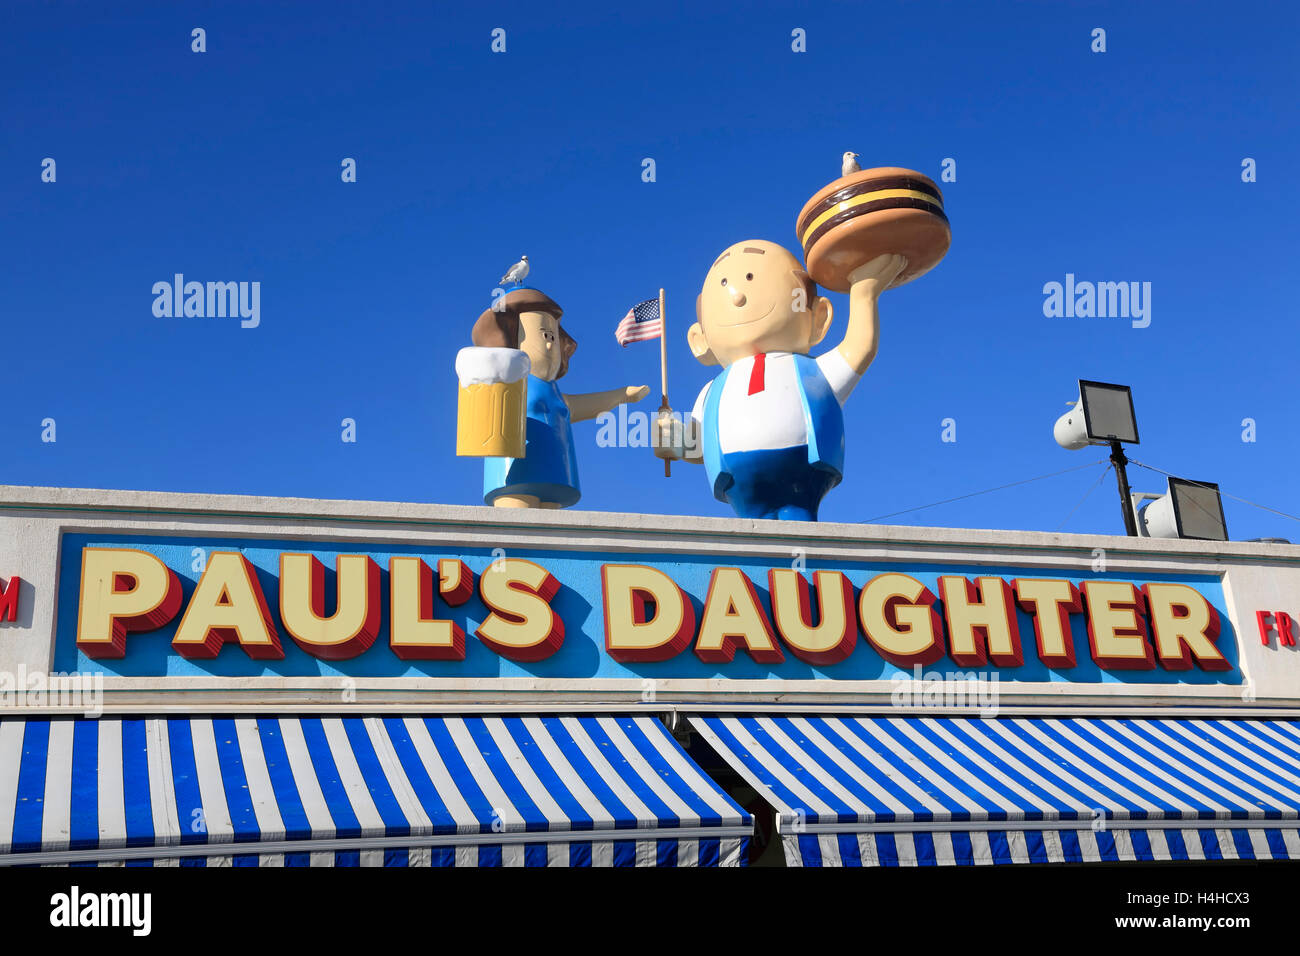 Paul's Daugther snack bar, Coney Island Boardwalk, Brooklyn, New York, USA - Stock Image